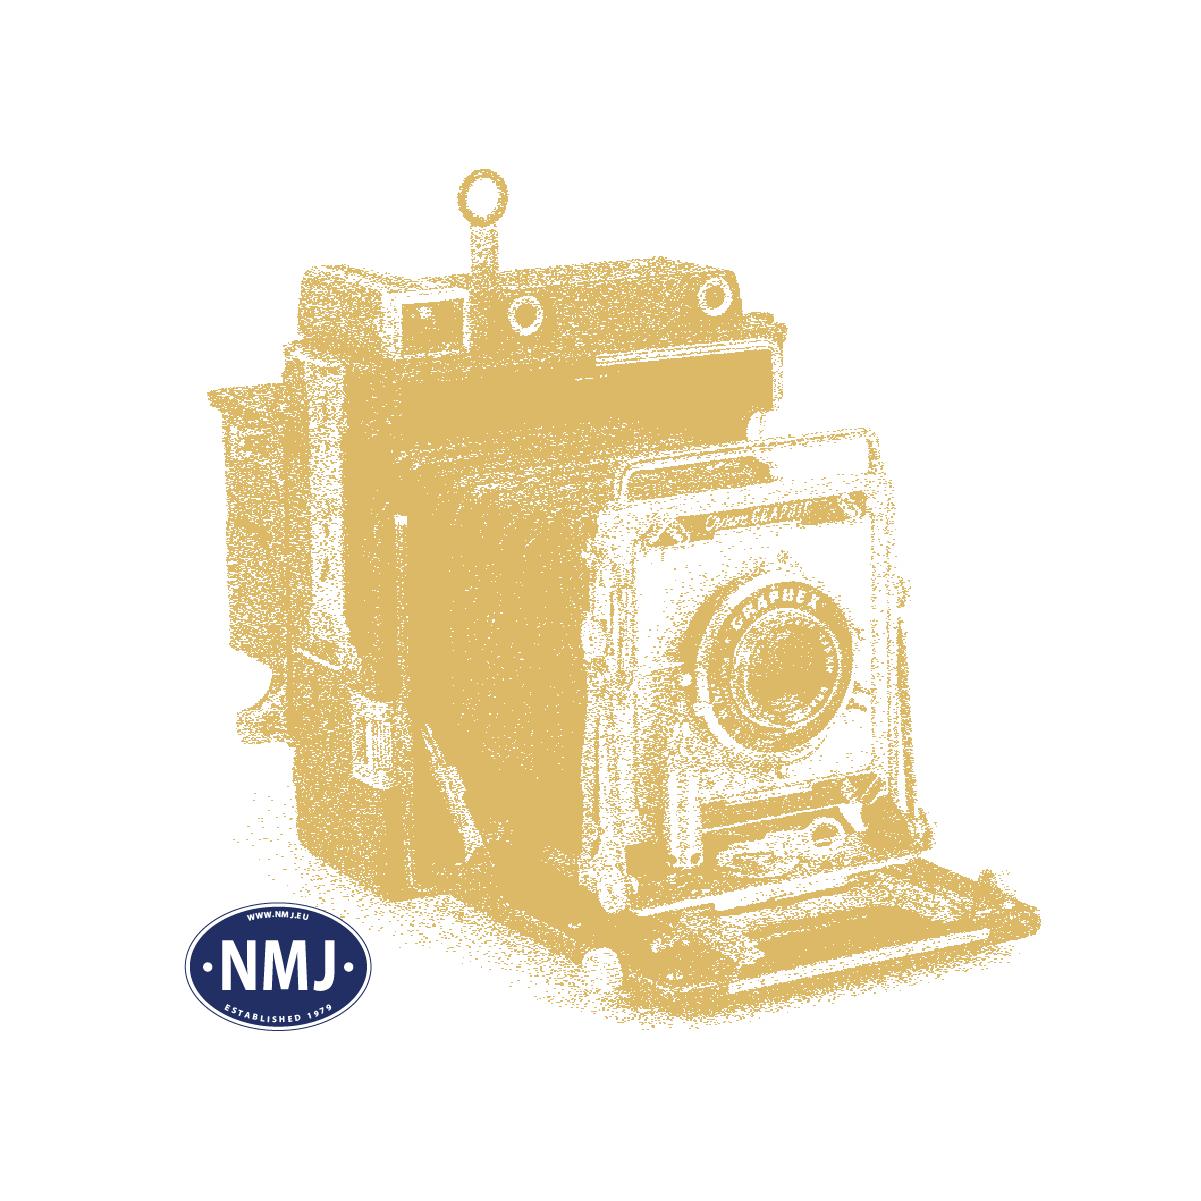 NMJT90303 - NMJ Topline 91303 CFL 1604, DCC Sound, HO